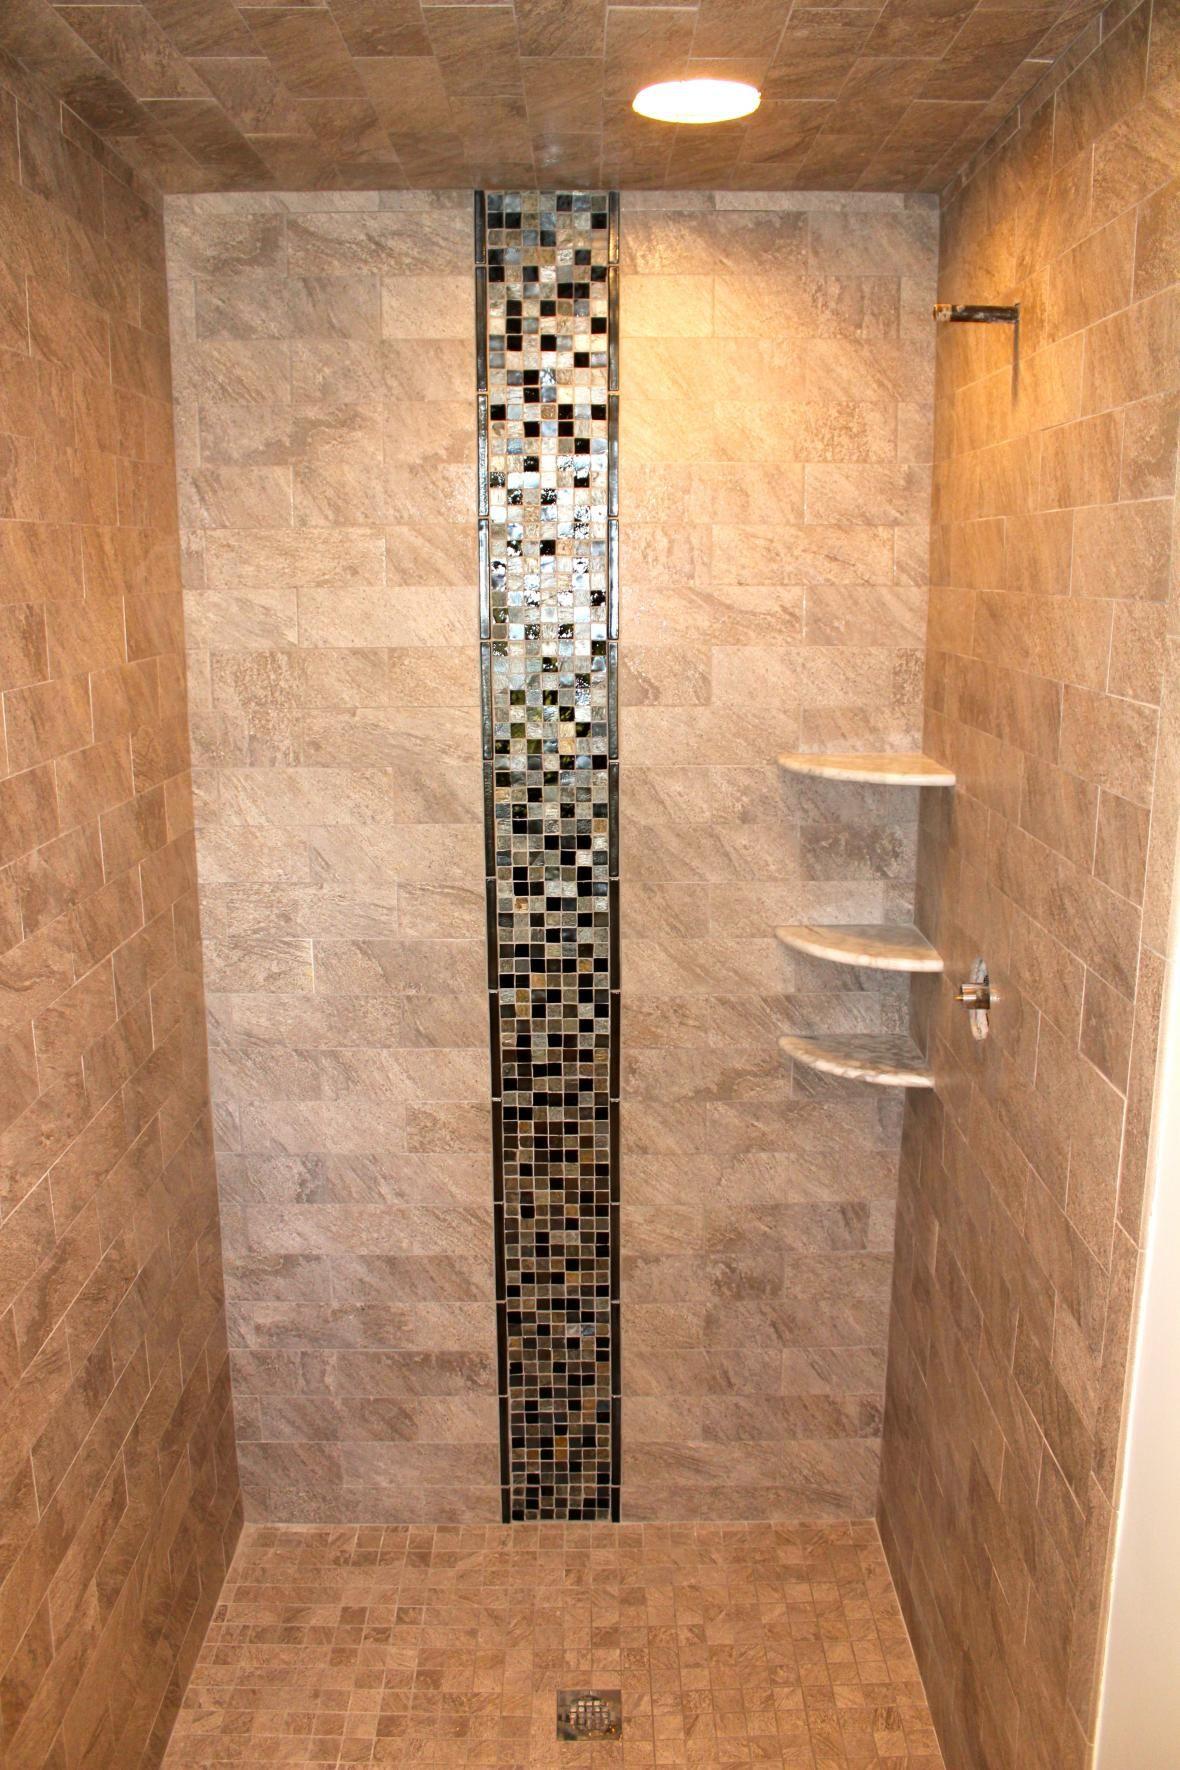 Bathroom Ideas Shower Enclosure Tile